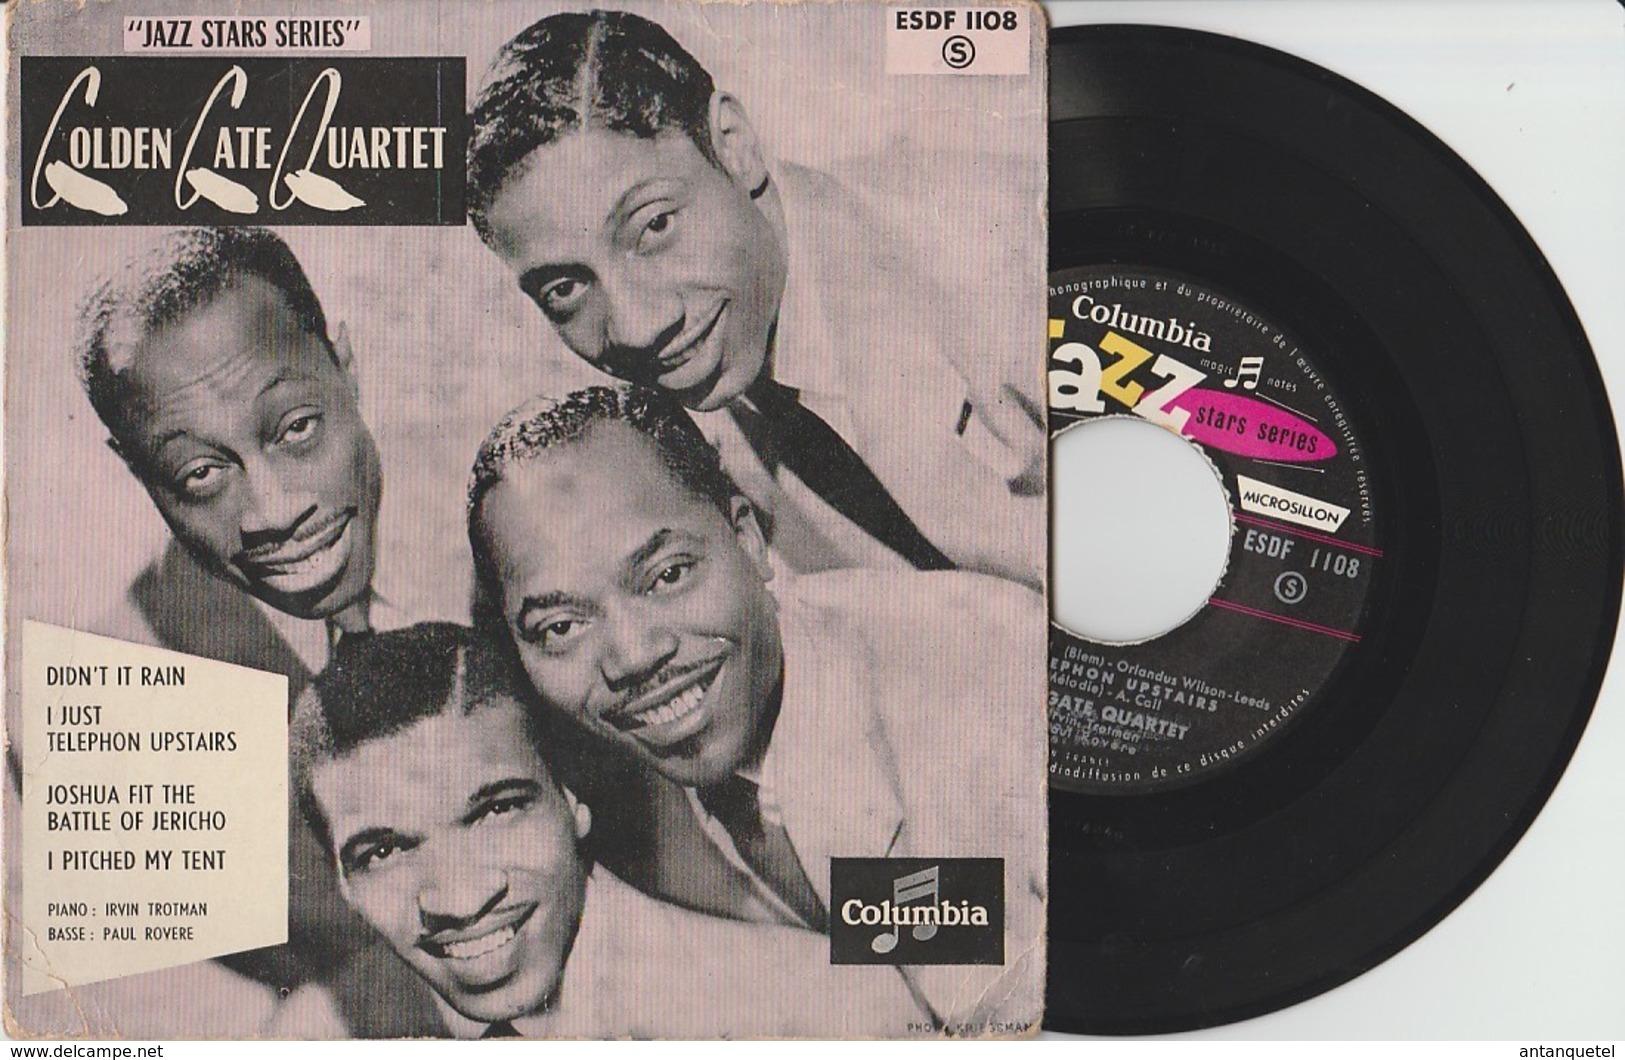 Disque Vinyle 45 Tours—Golden Gate Quartet—Didn't It Rain—ESDF 1108—'60 - 45 Rpm - Maxi-Singles